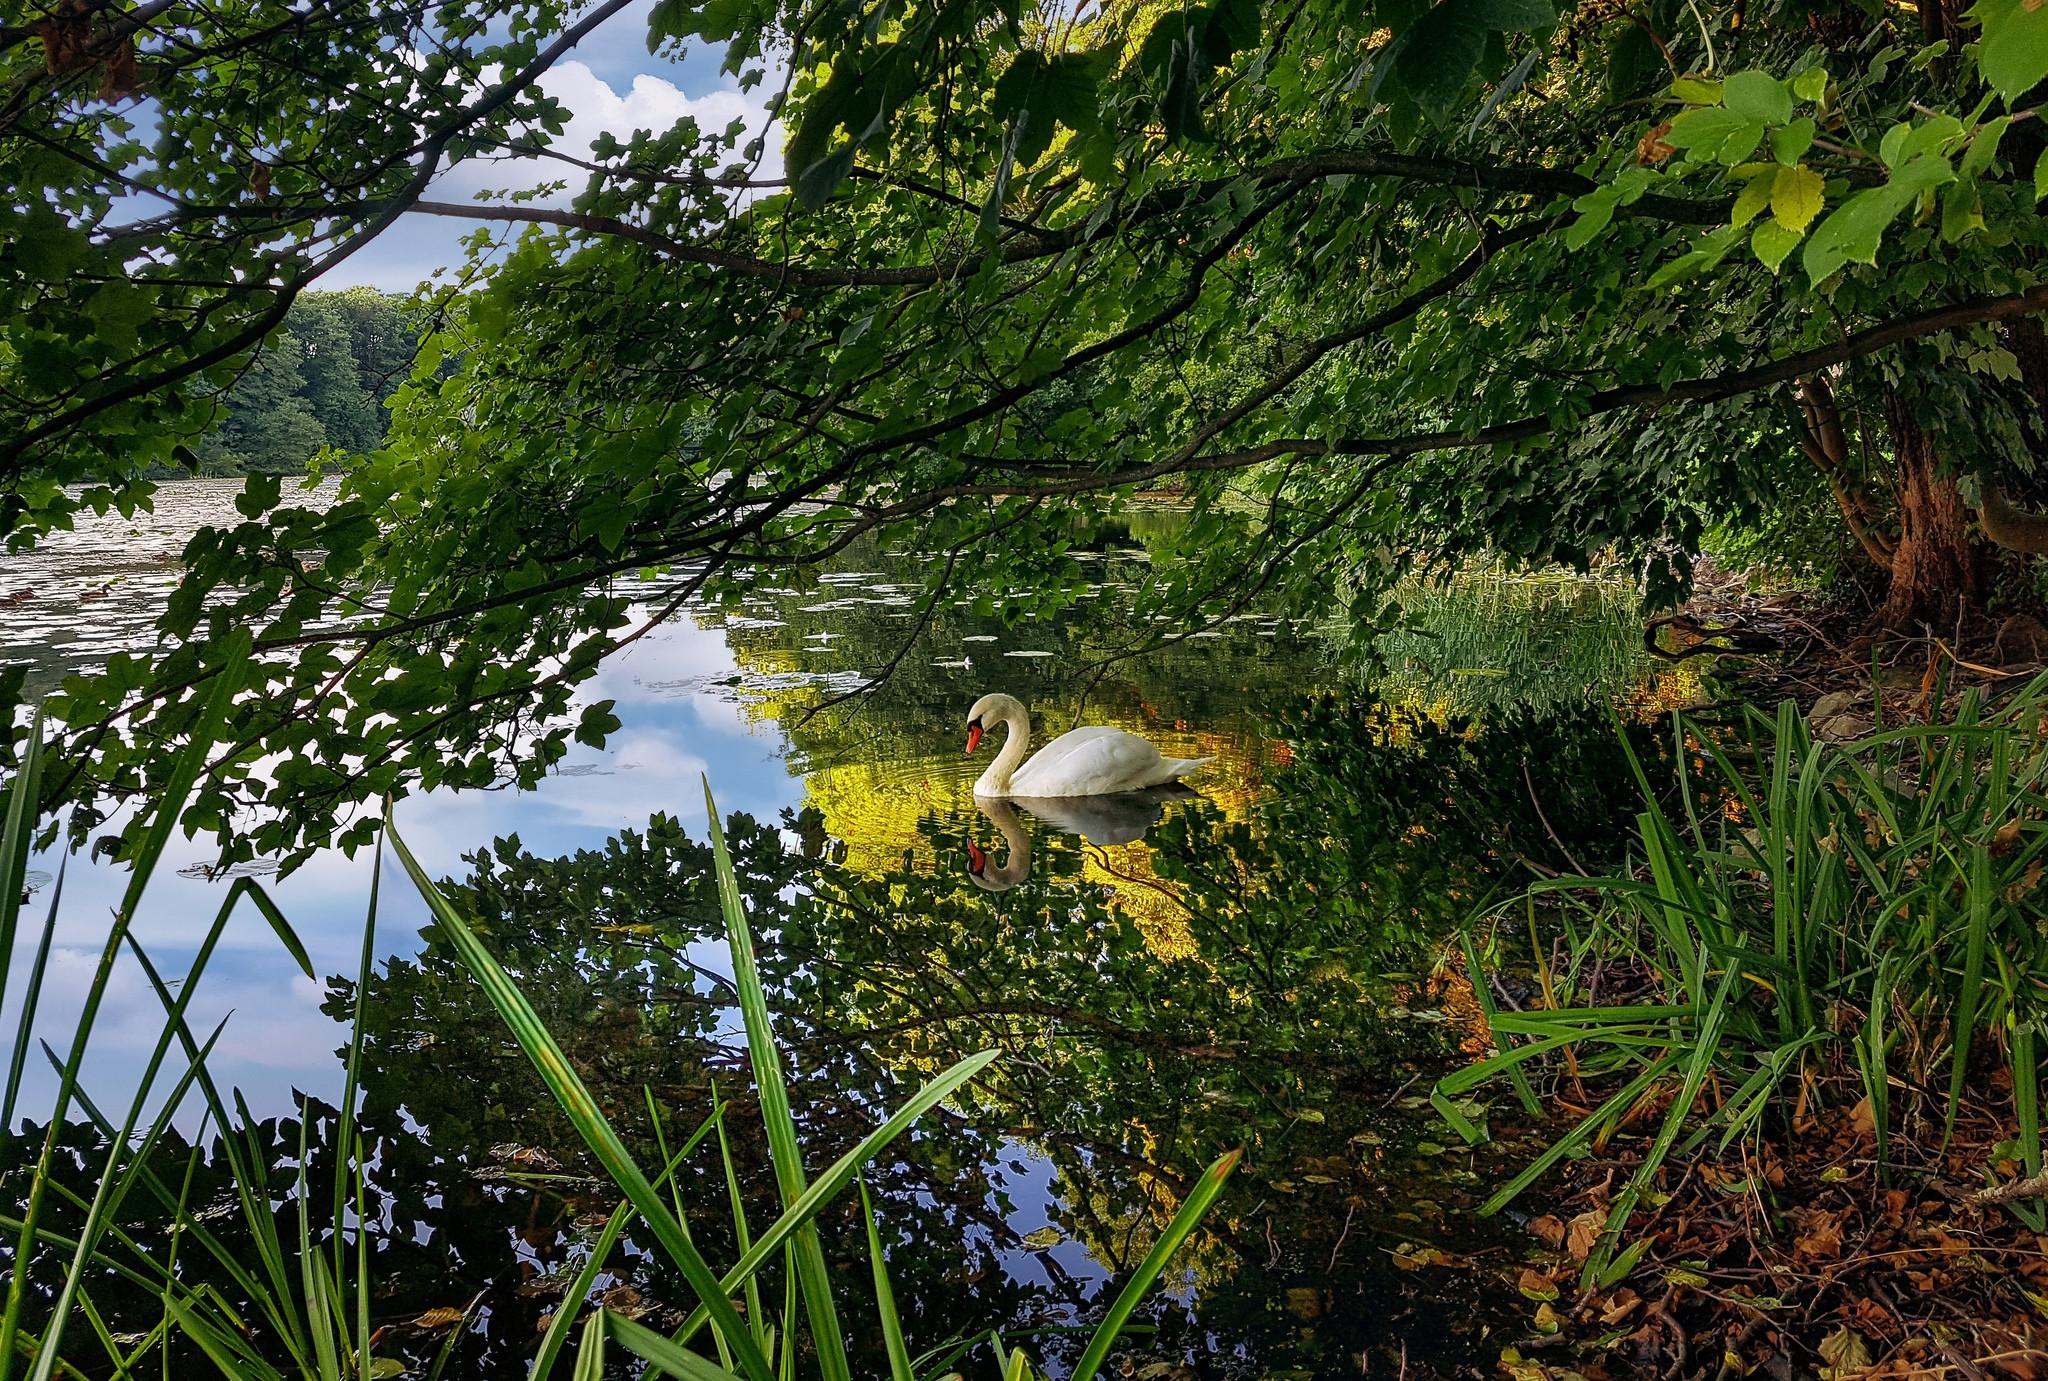 обои река, деревья, лебедь, природа картинки фото